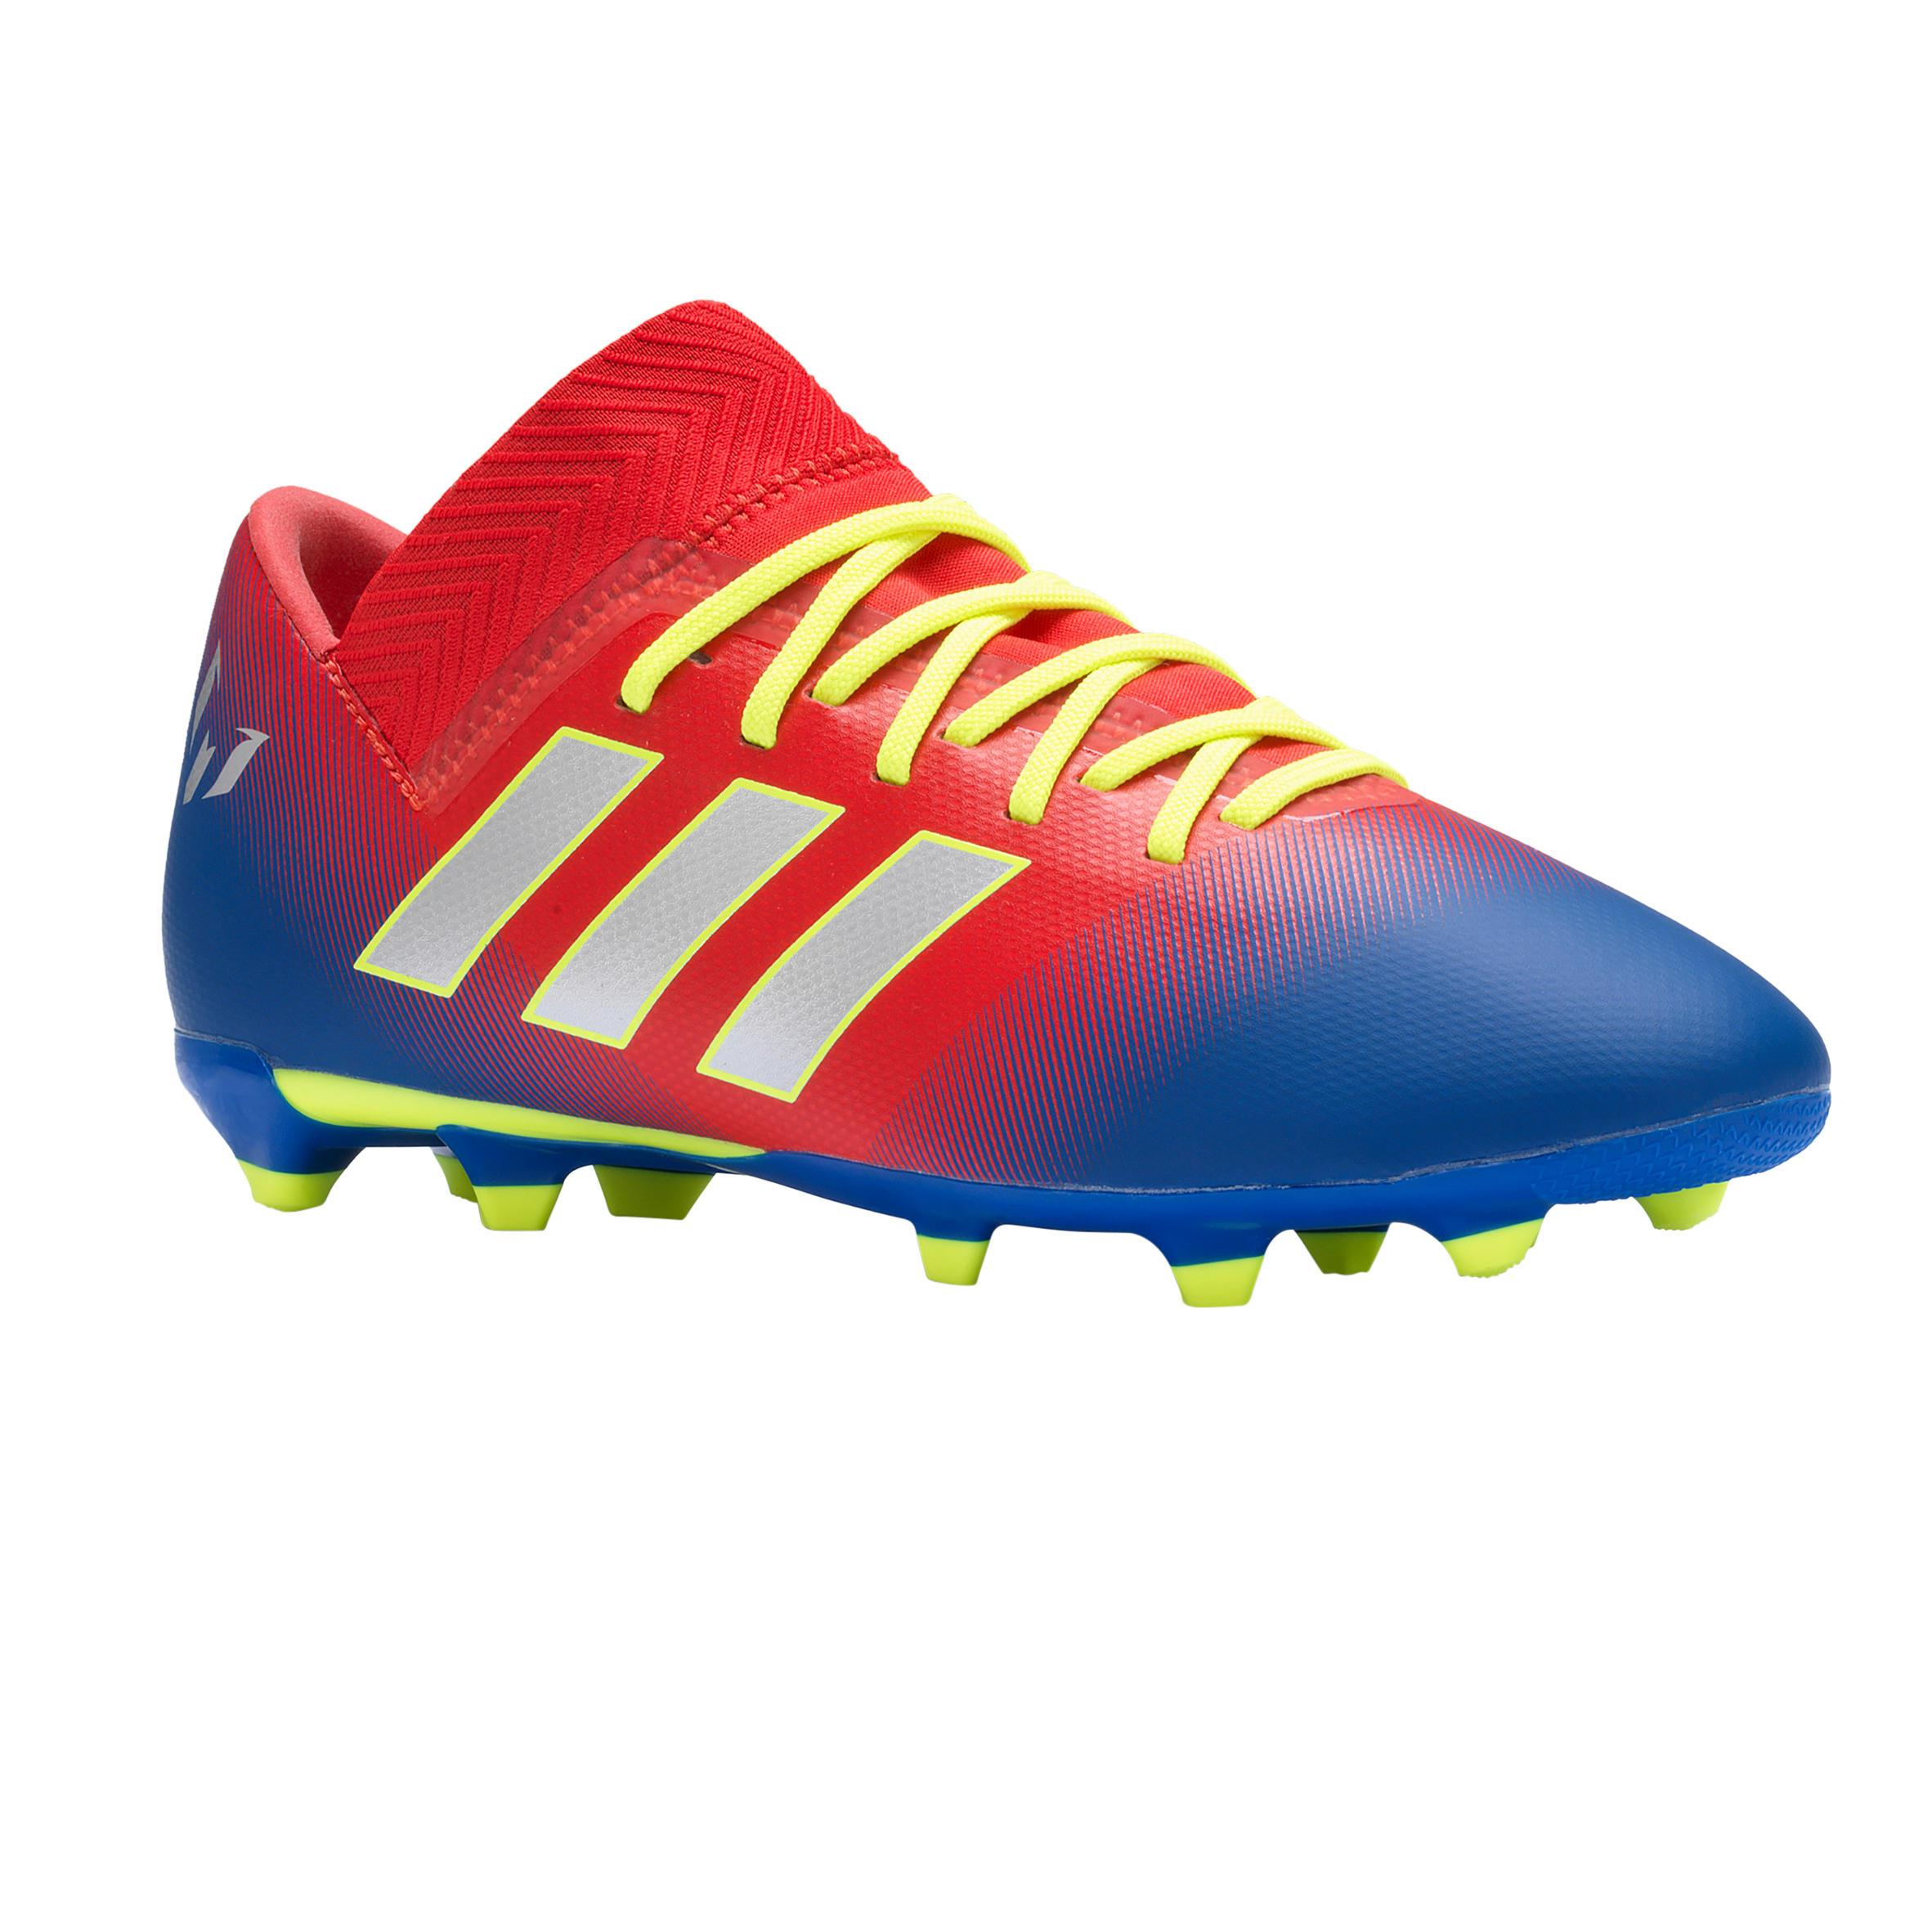 Adidas Voetbalschoenen kind Nemeziz Messi 18.3 FG rood/blauw